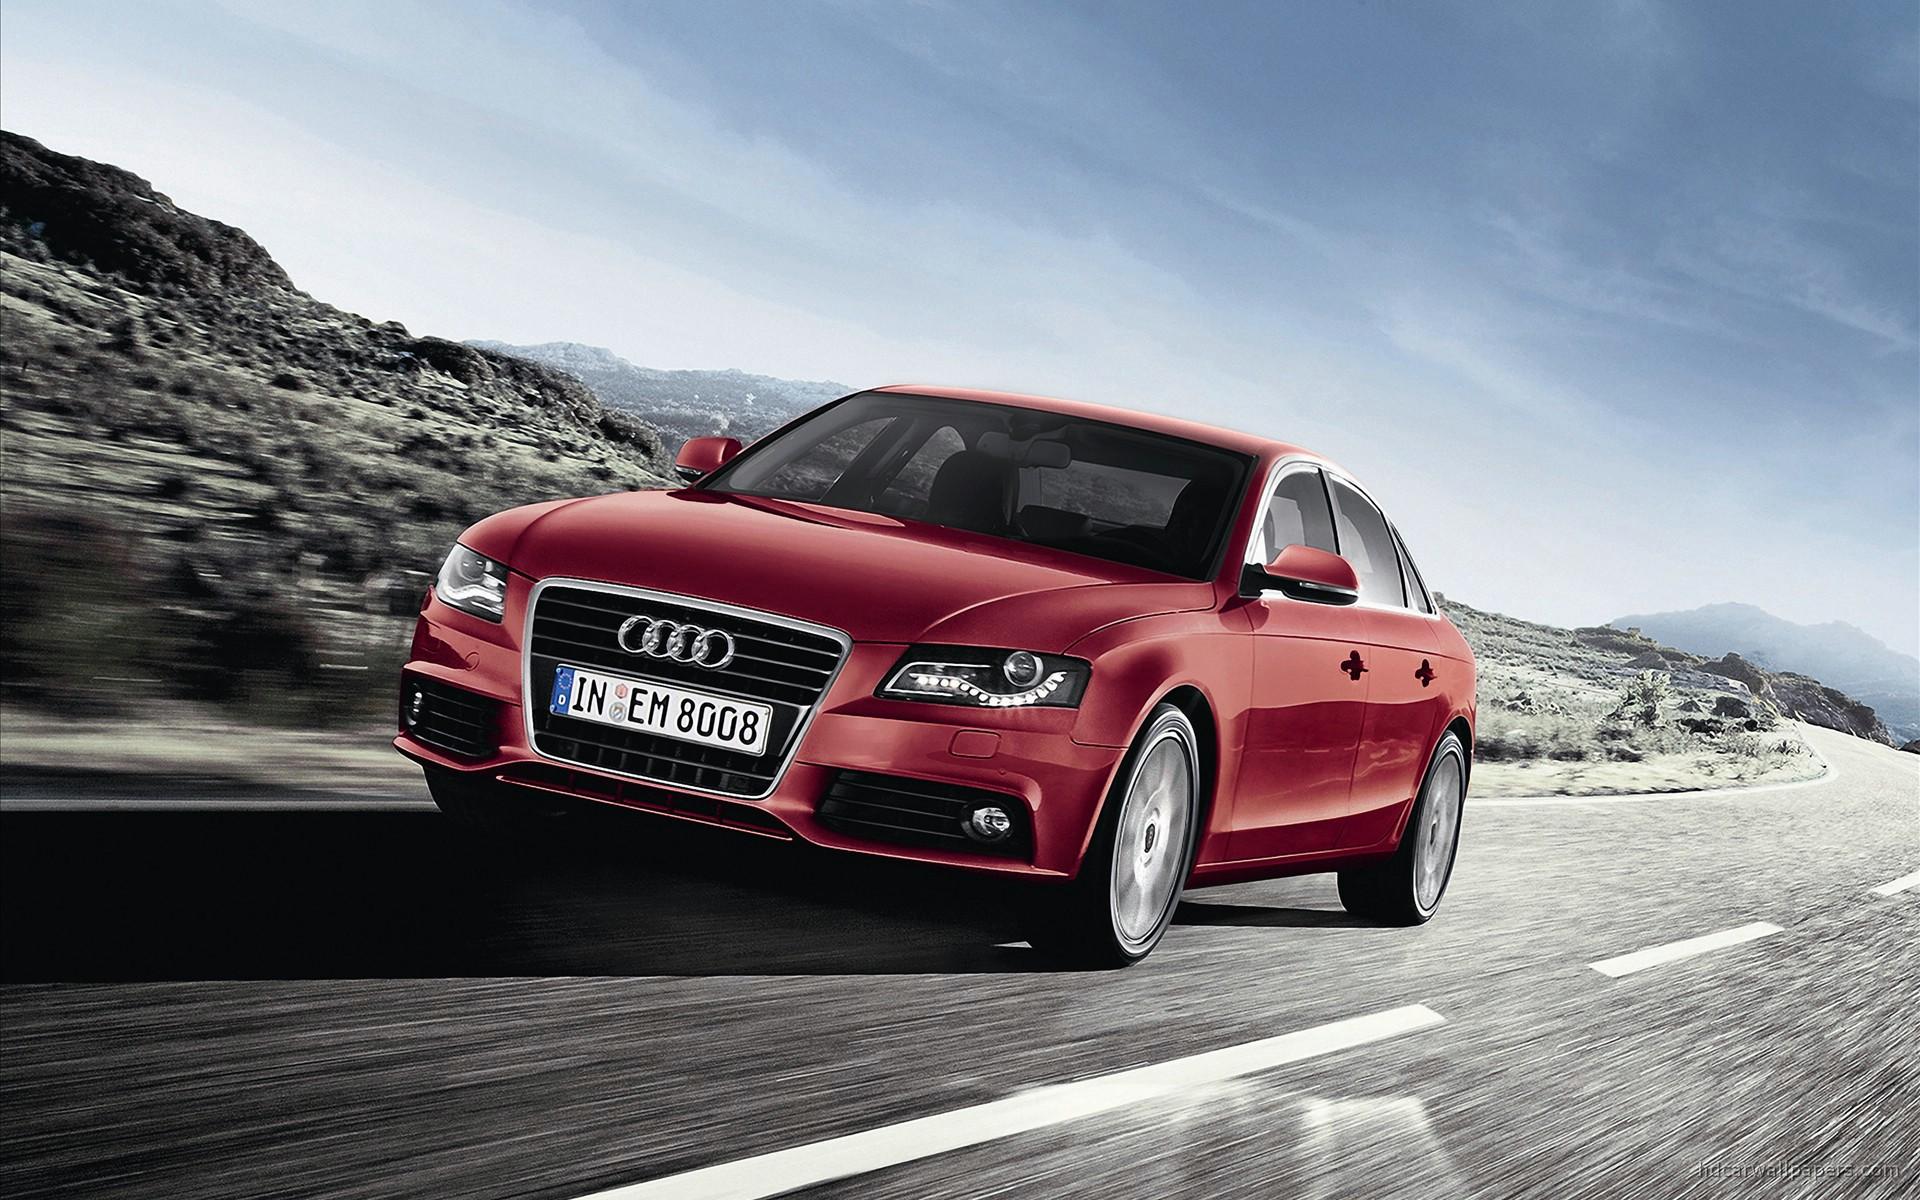 Audi R8 Hd Widescreen Wallpapers 1080p 2009 Audi A4 2 Tdi E Wallpaper Hd Car Wallpapers Id 208